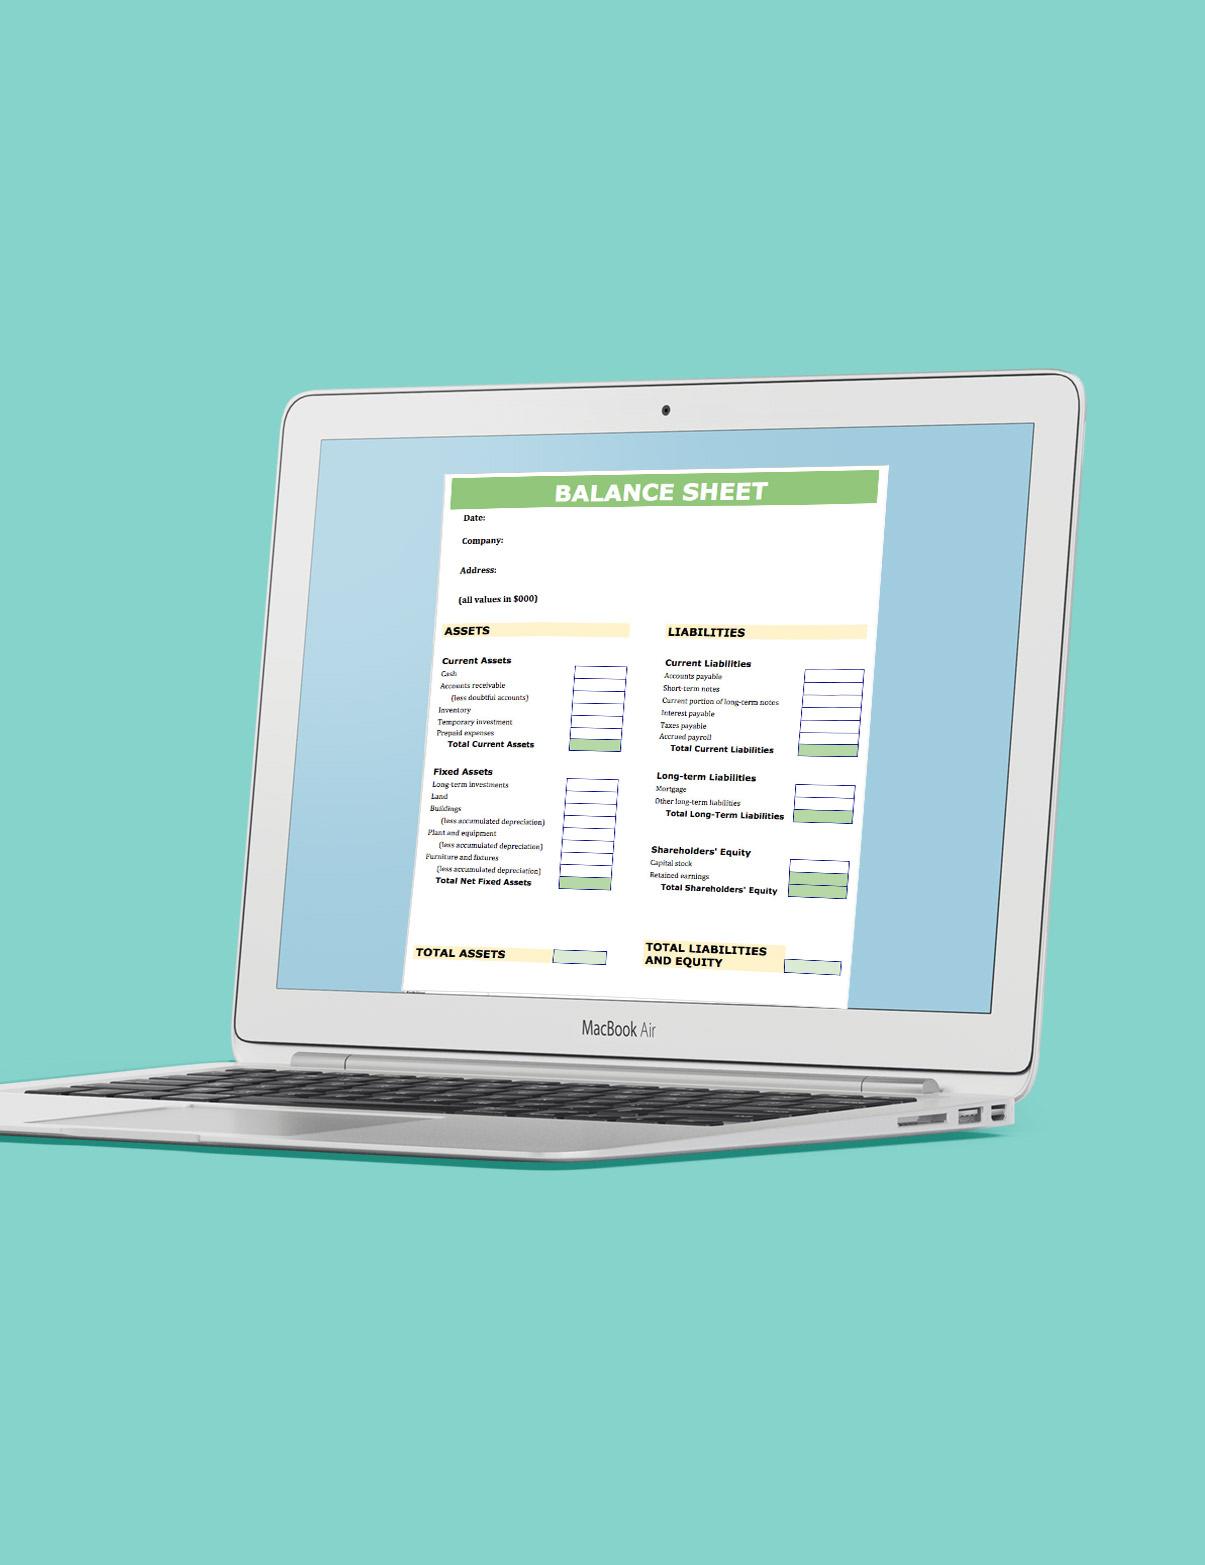 Google Spreadsheet Balance Sheet Template in Balance Sheet Template